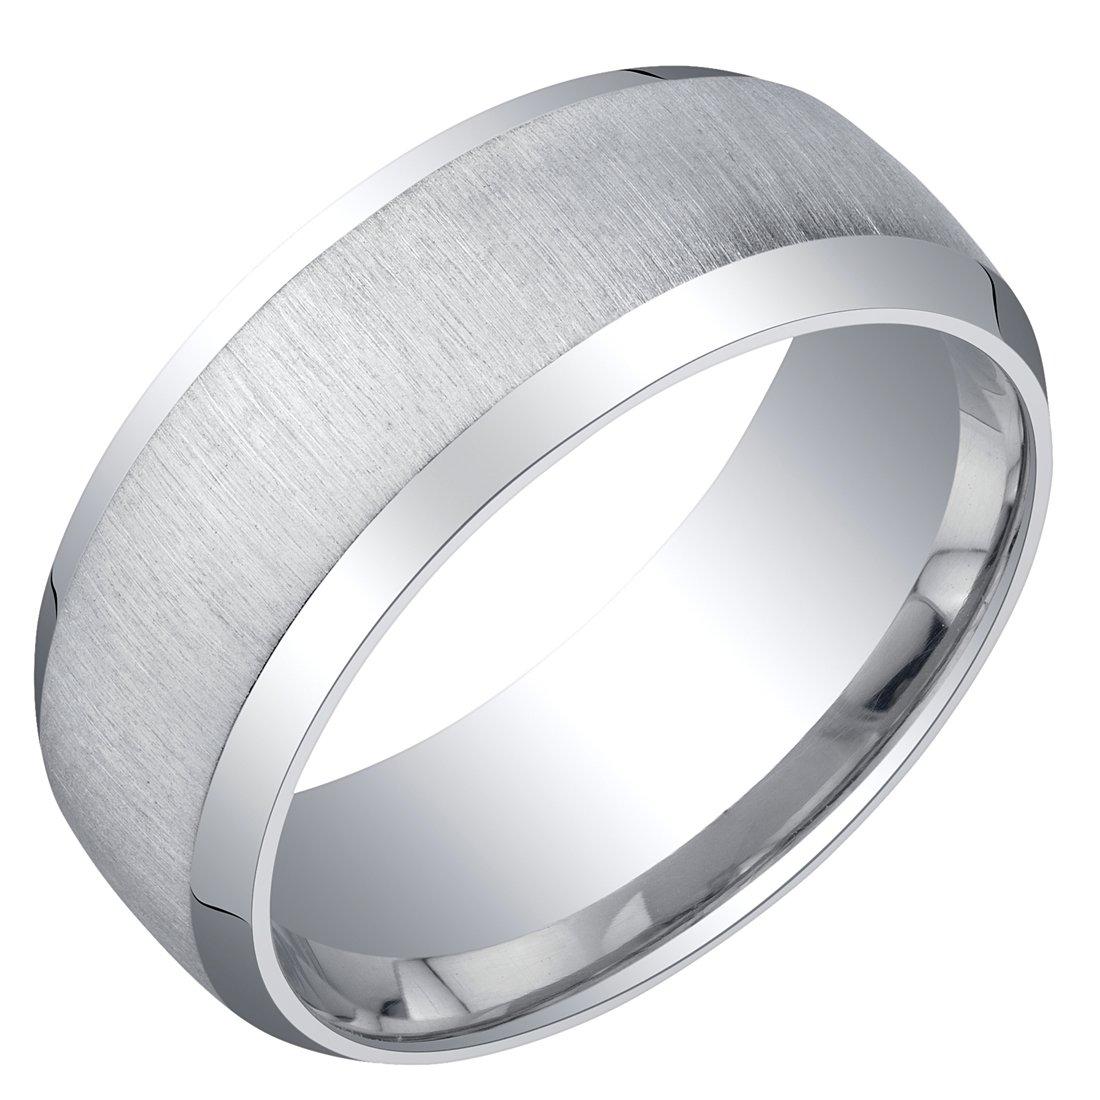 Mens Sterling Silver Beveled Edge Wedding Ring Band in Brushed Matte 8mm Comfort Fit Size 12